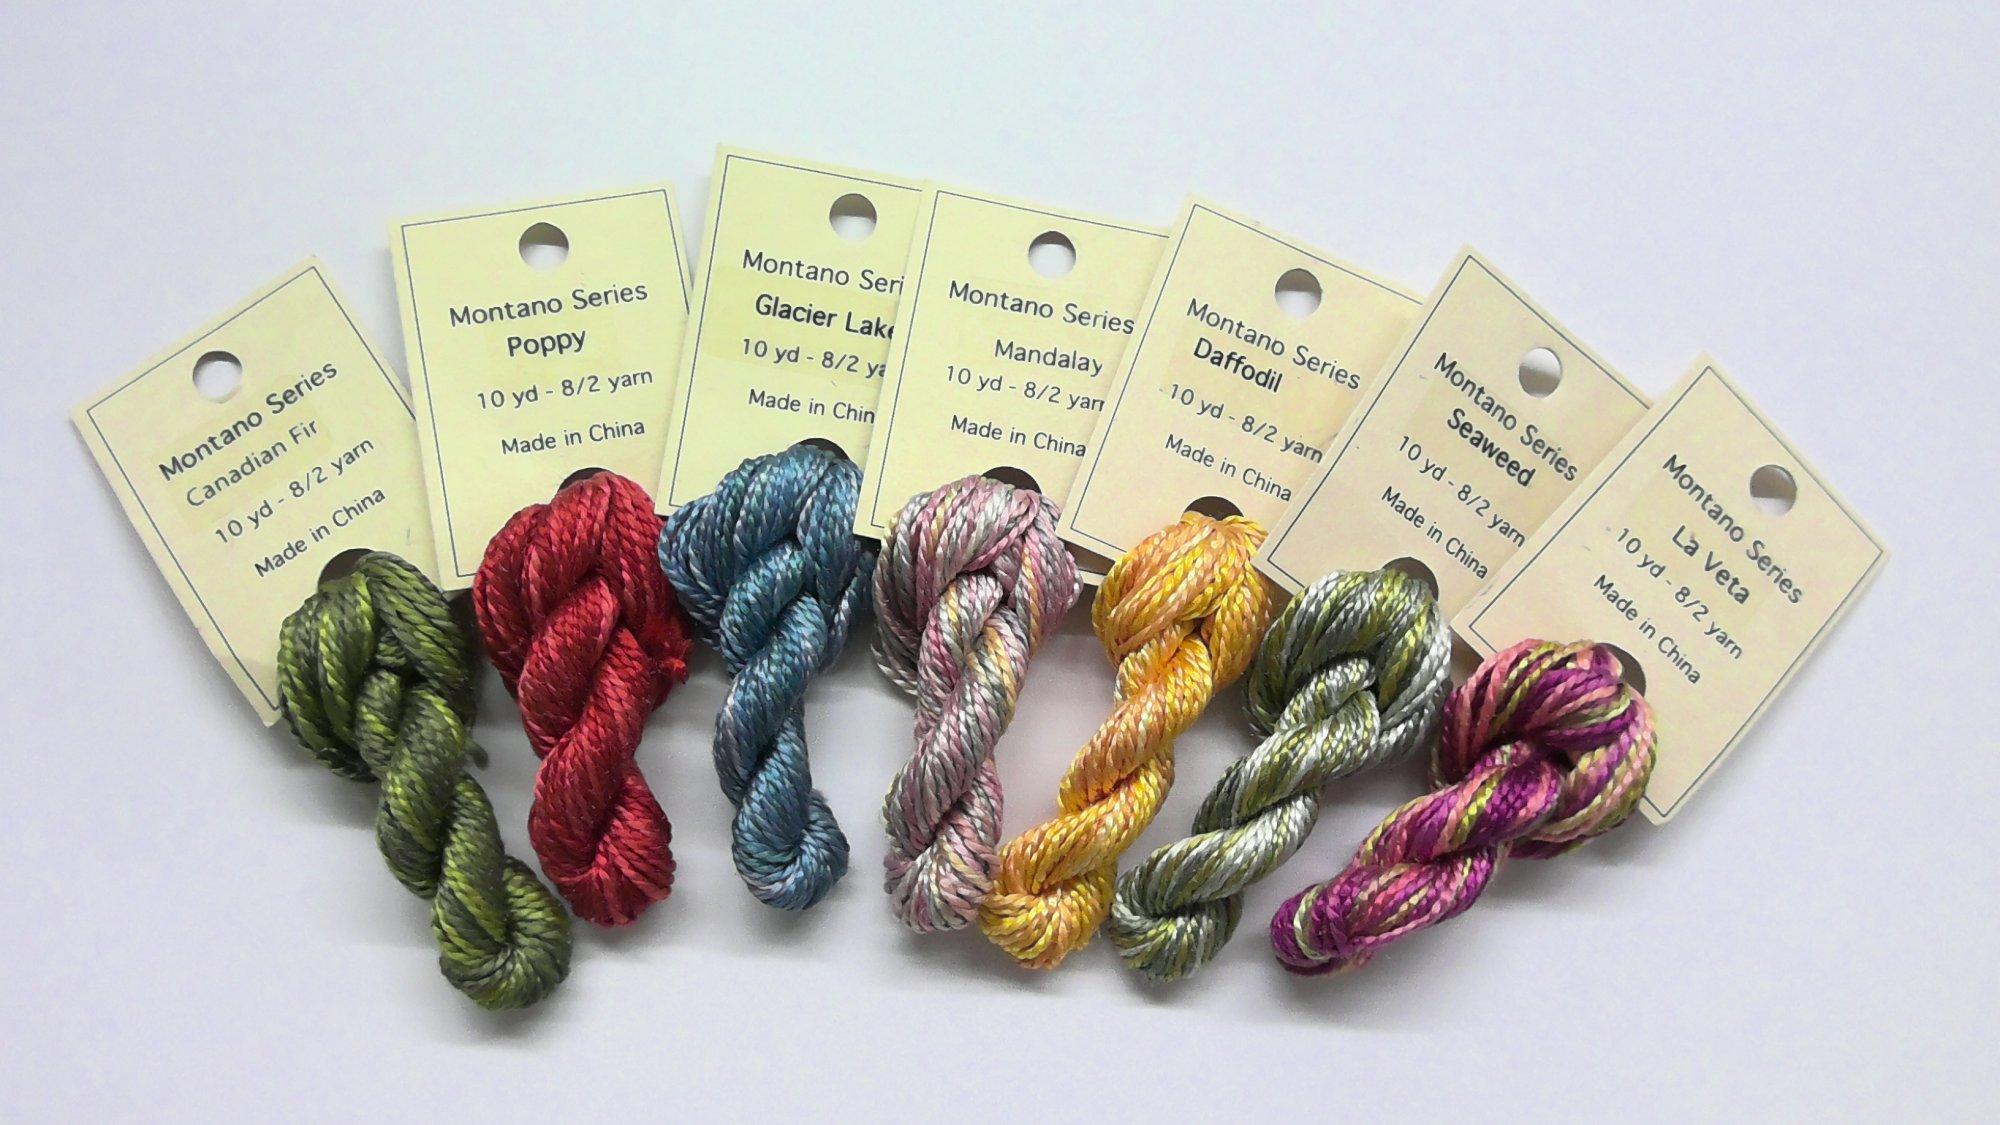 8/2 Floss - 10 yd  -  Reeled Silk